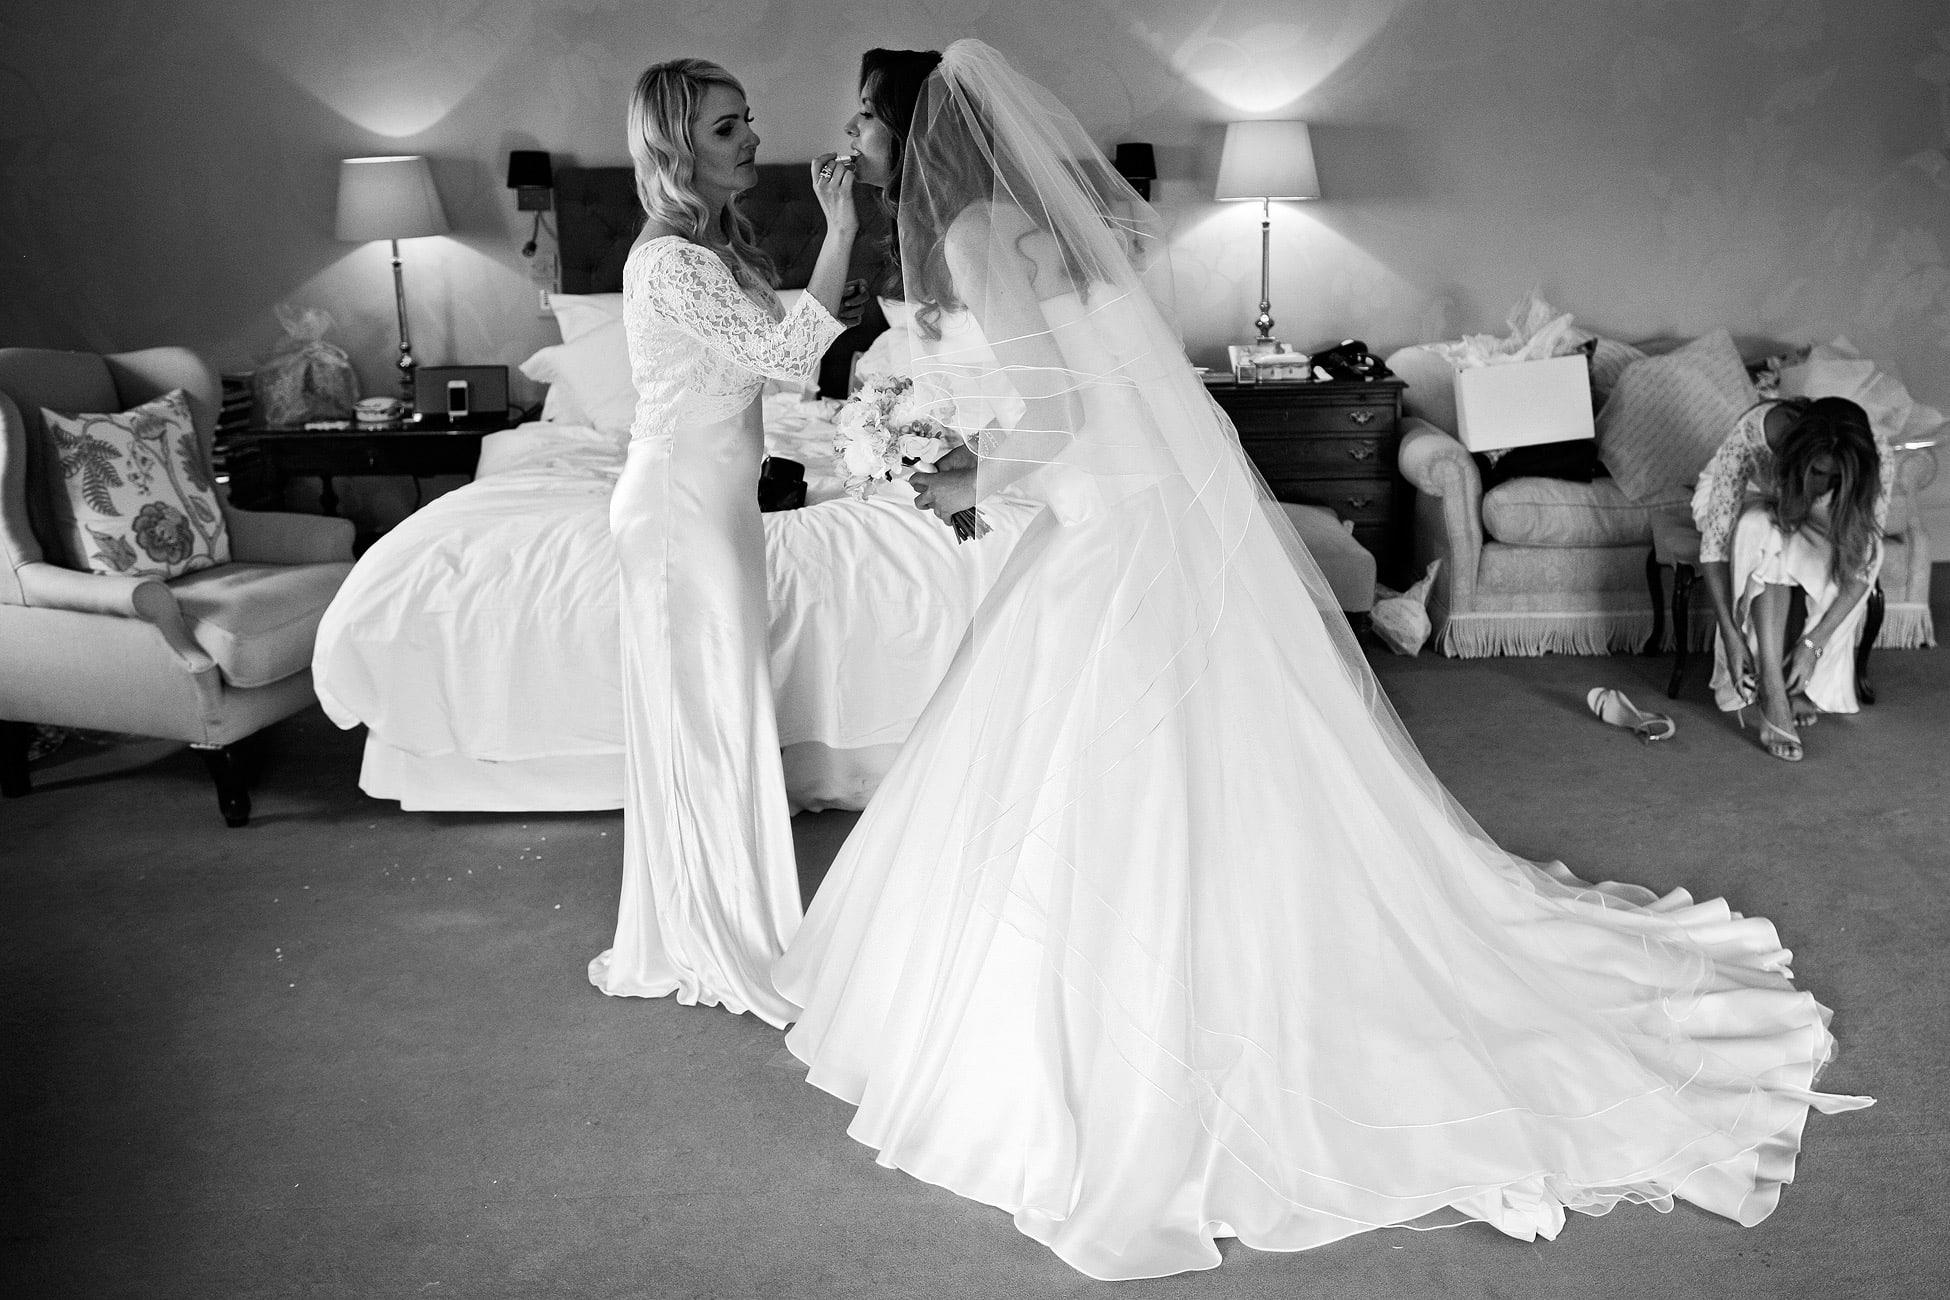 bridesmaid-applies-lipstick-to-bride